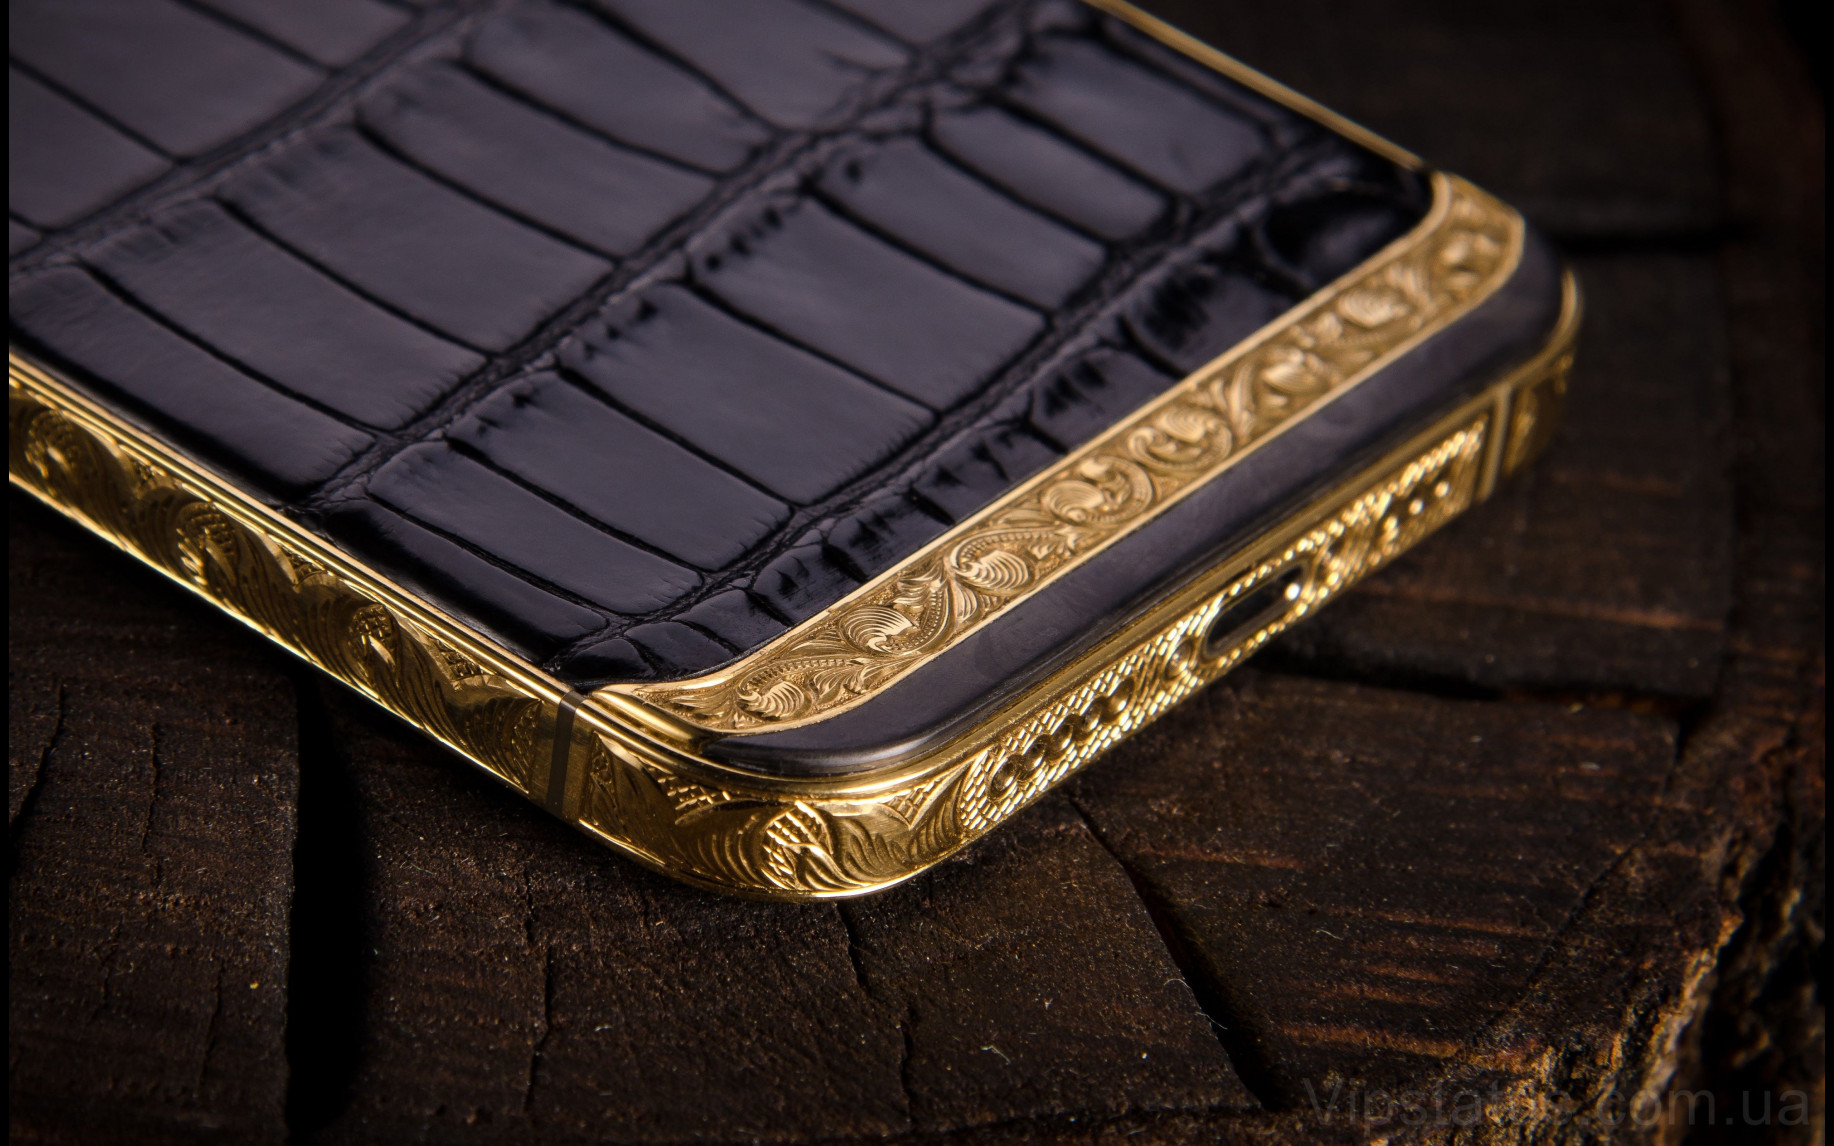 Elite Gold Edition IPHONE 12 PRO MAX 512 GB Gold Edition IPHONE 12 PRO MAX 512 GB image 6